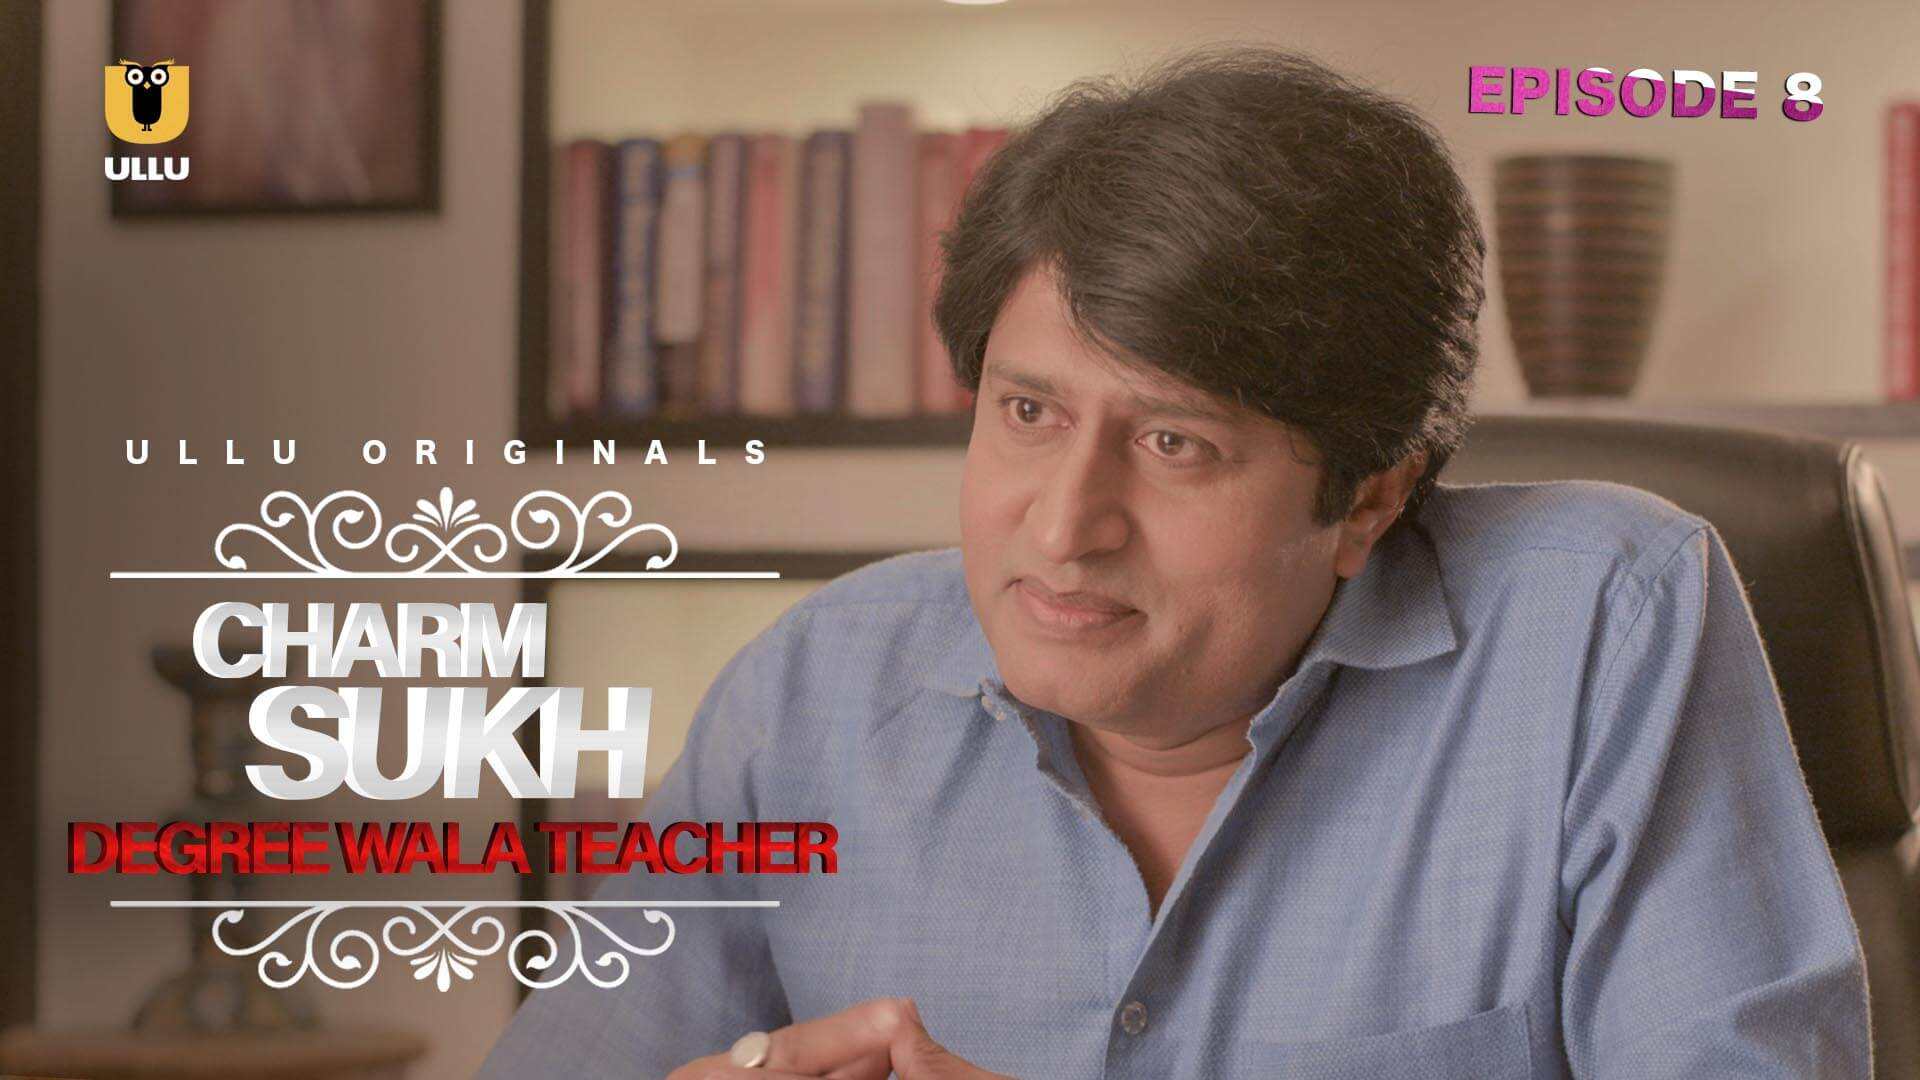 Charmsukh (Degree Wala Teacher) 2019 S01 banner